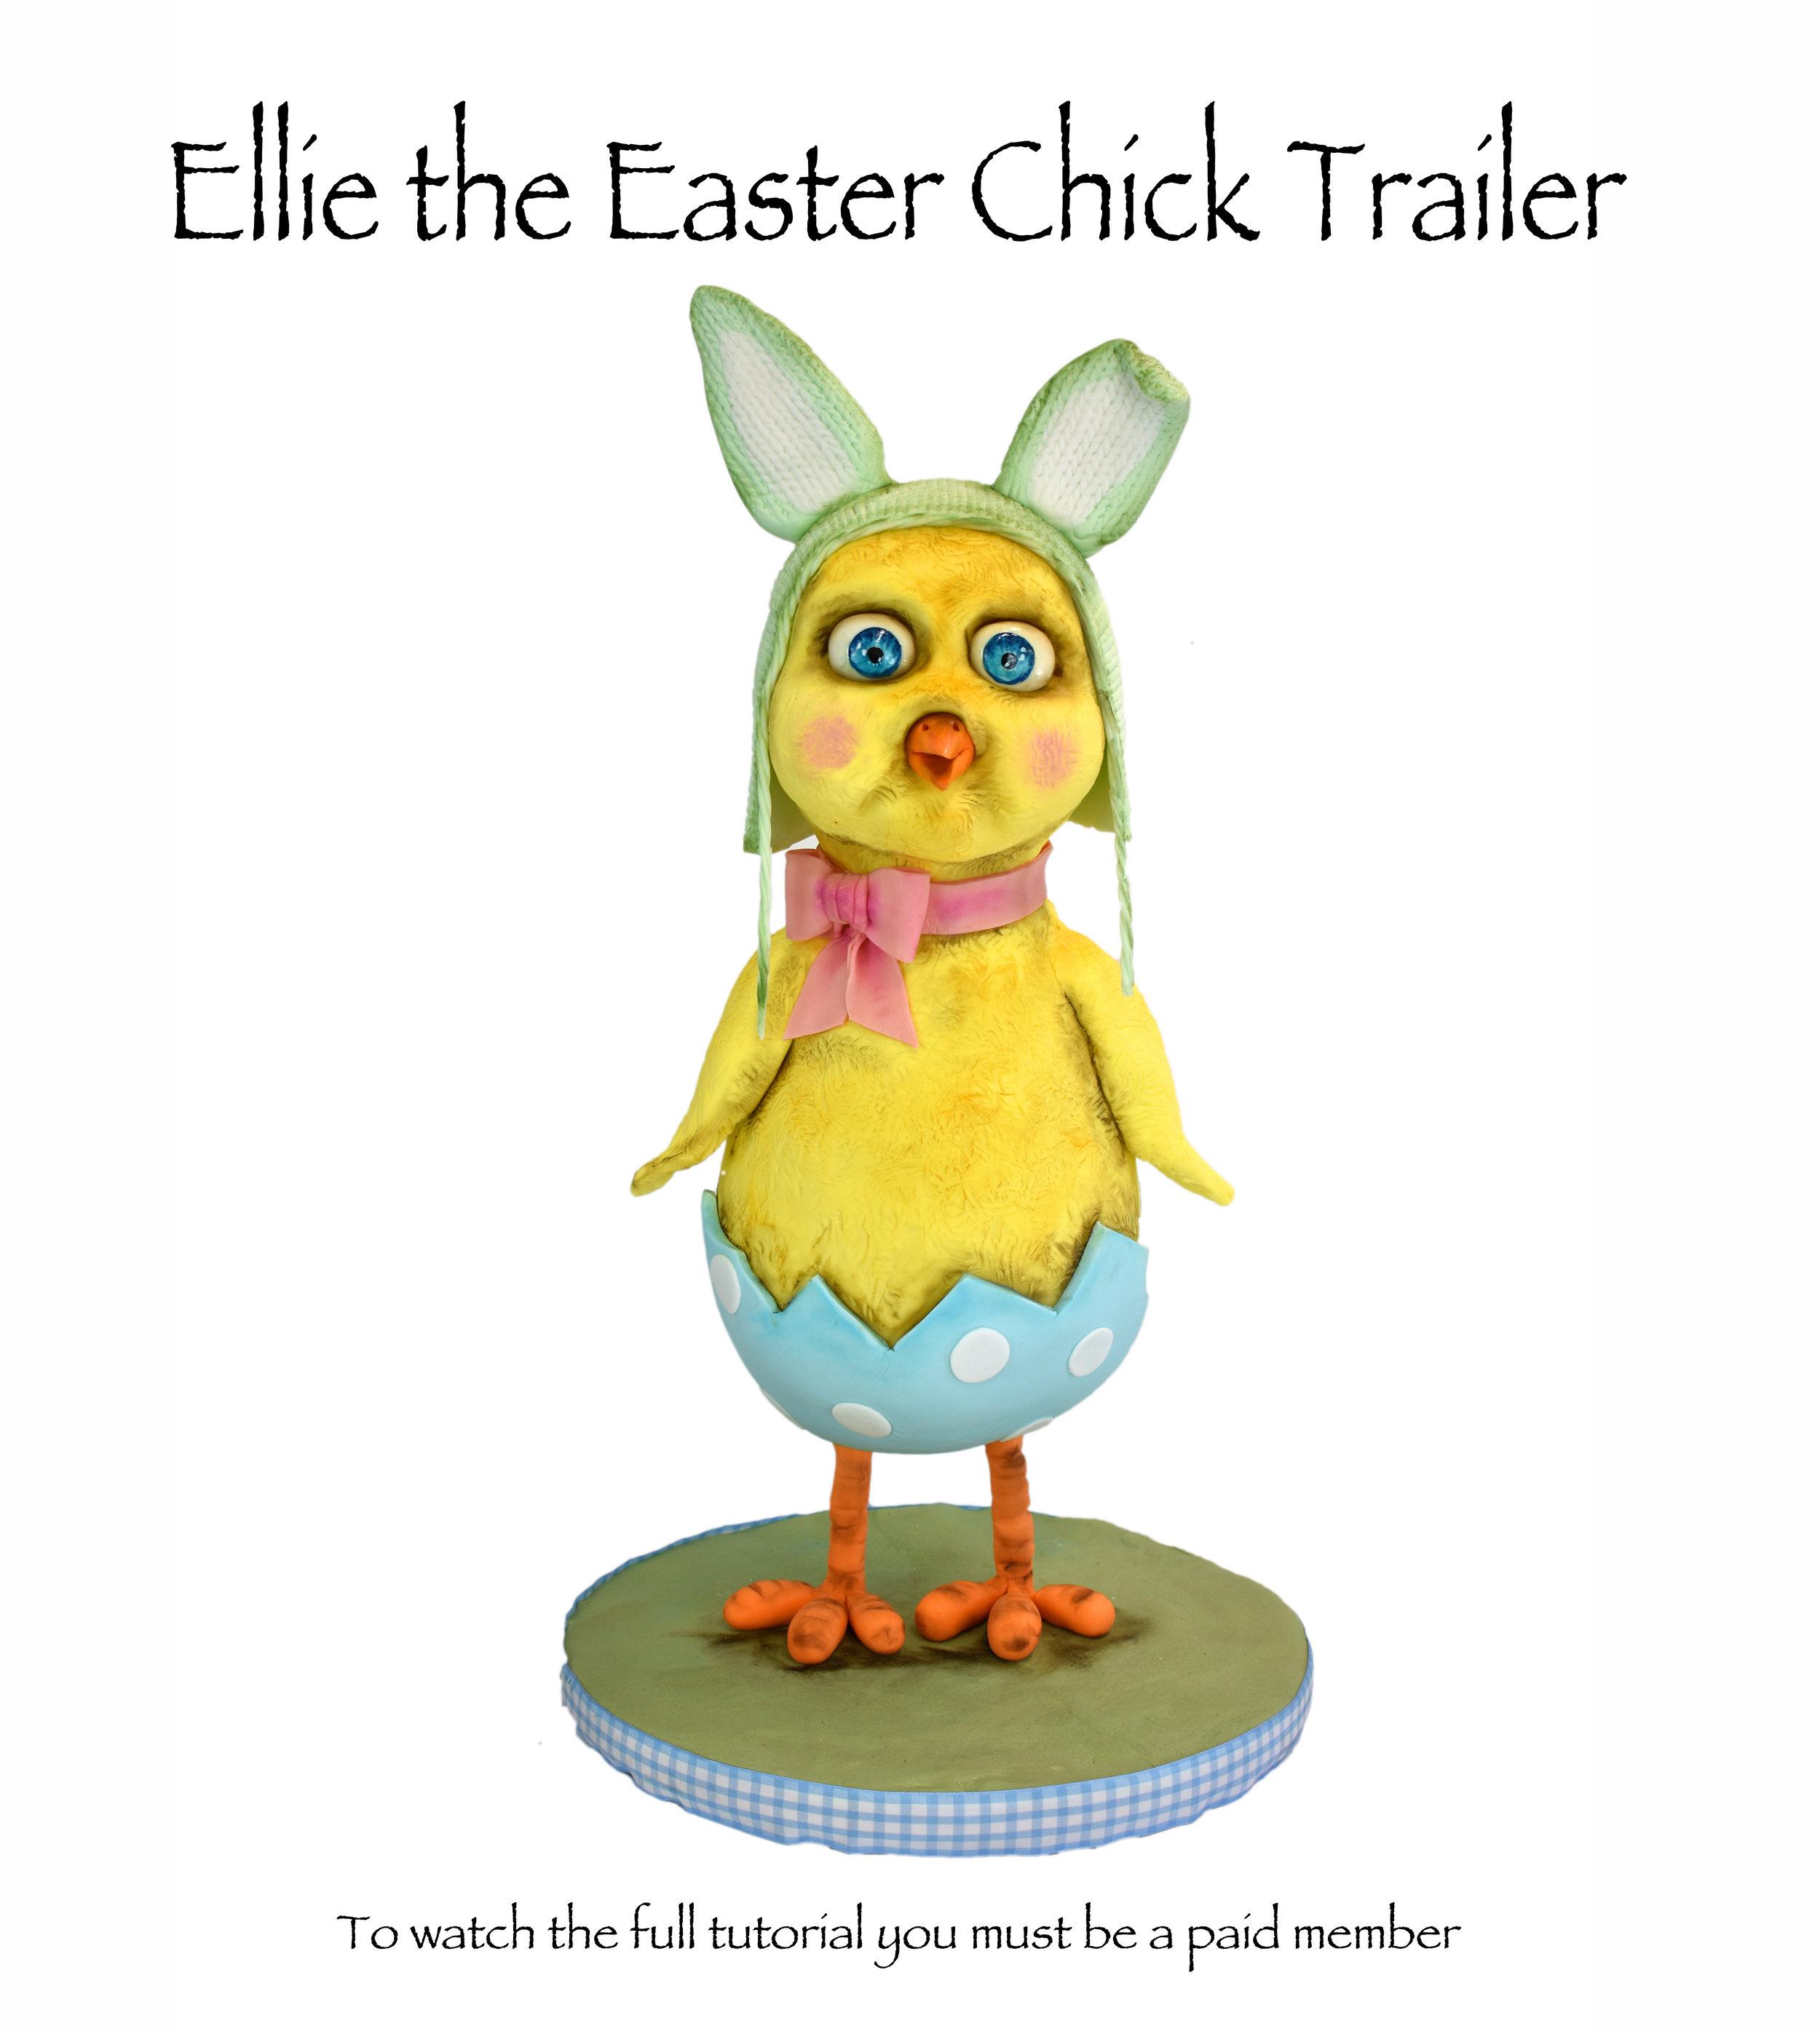 ellie trailer.jpg